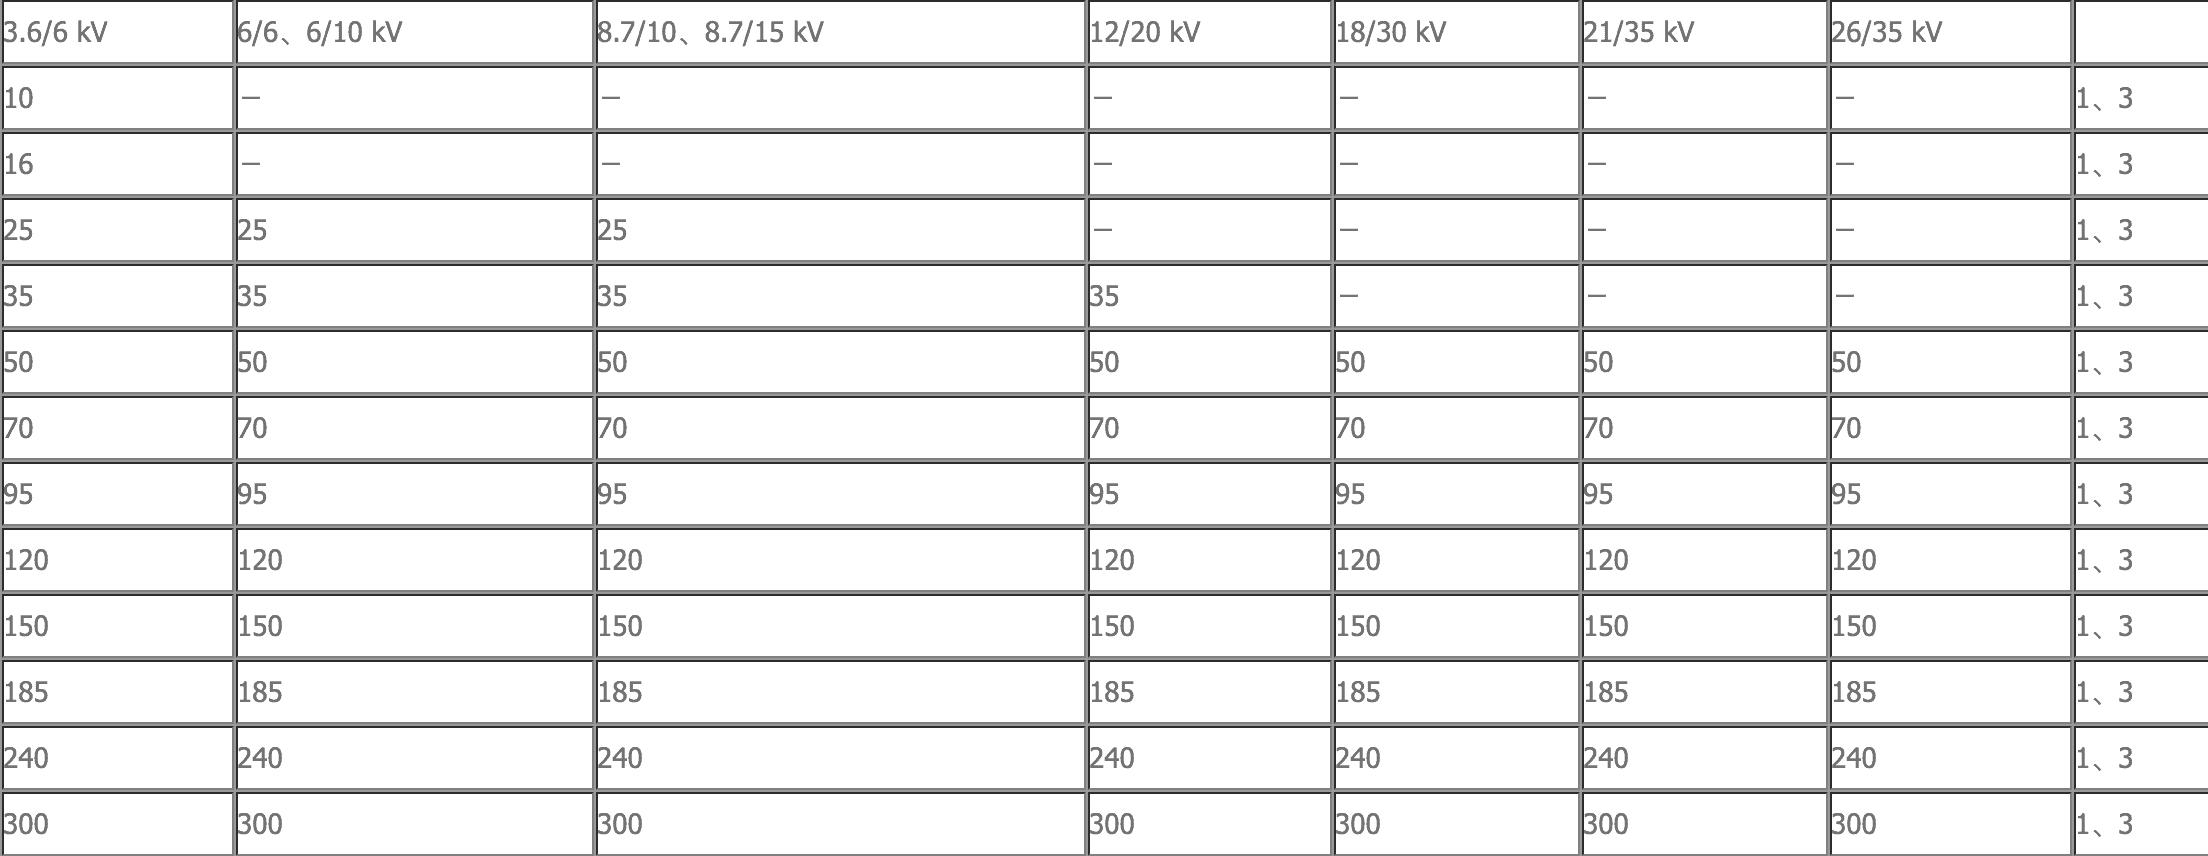 Medium Voltage Cable data sheet